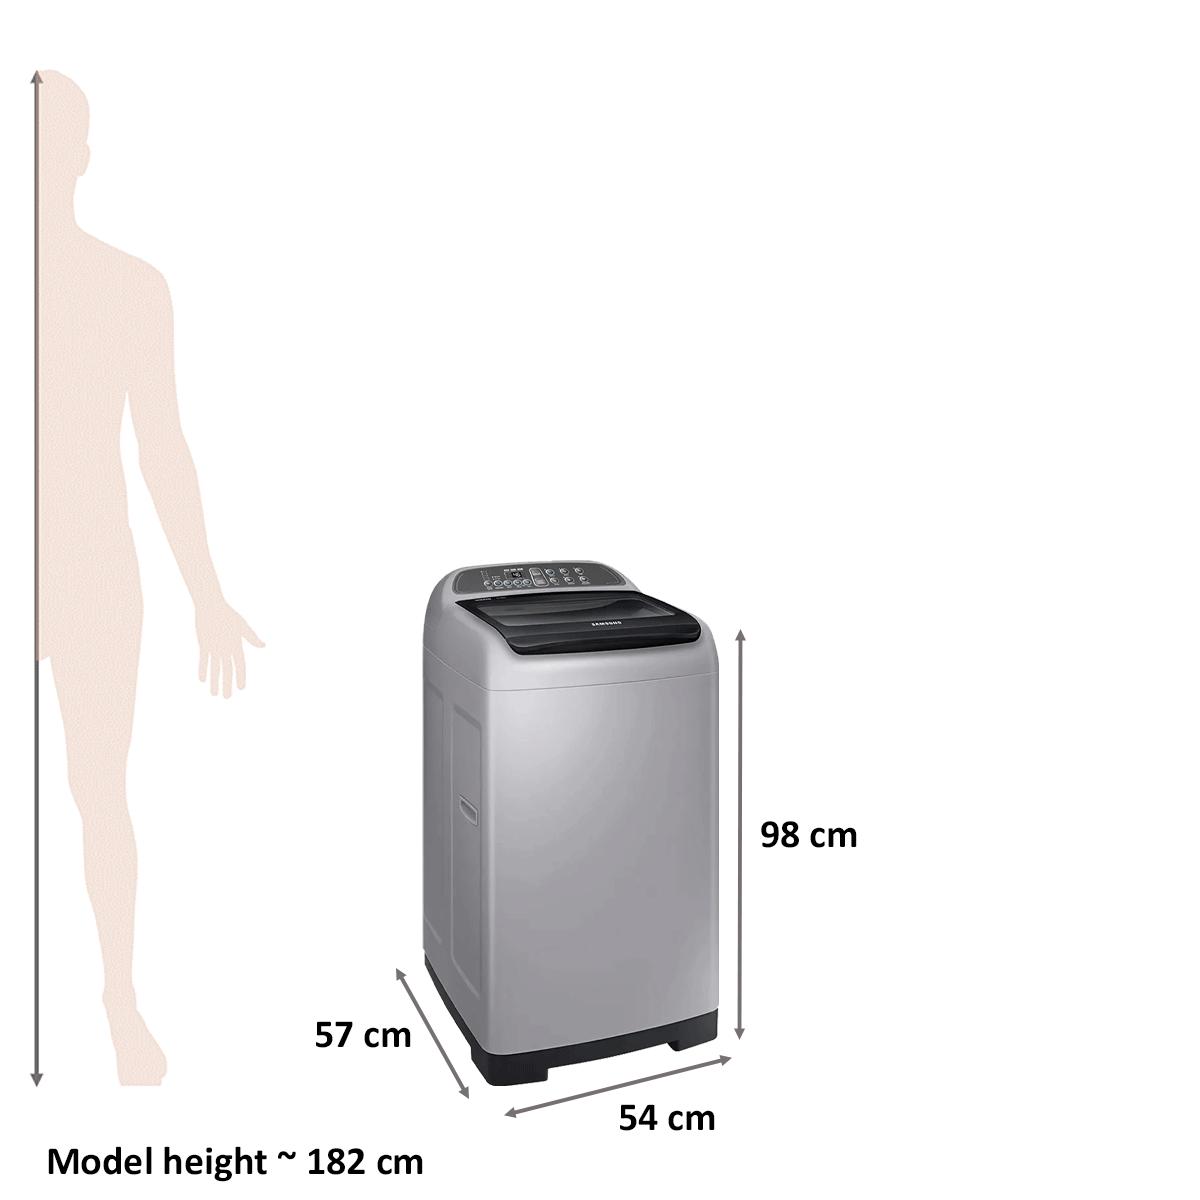 Samsung 6.2 kg Fully Automatic Top Loading Washing Machine (WA62M4200HA/TL, Silver) 2